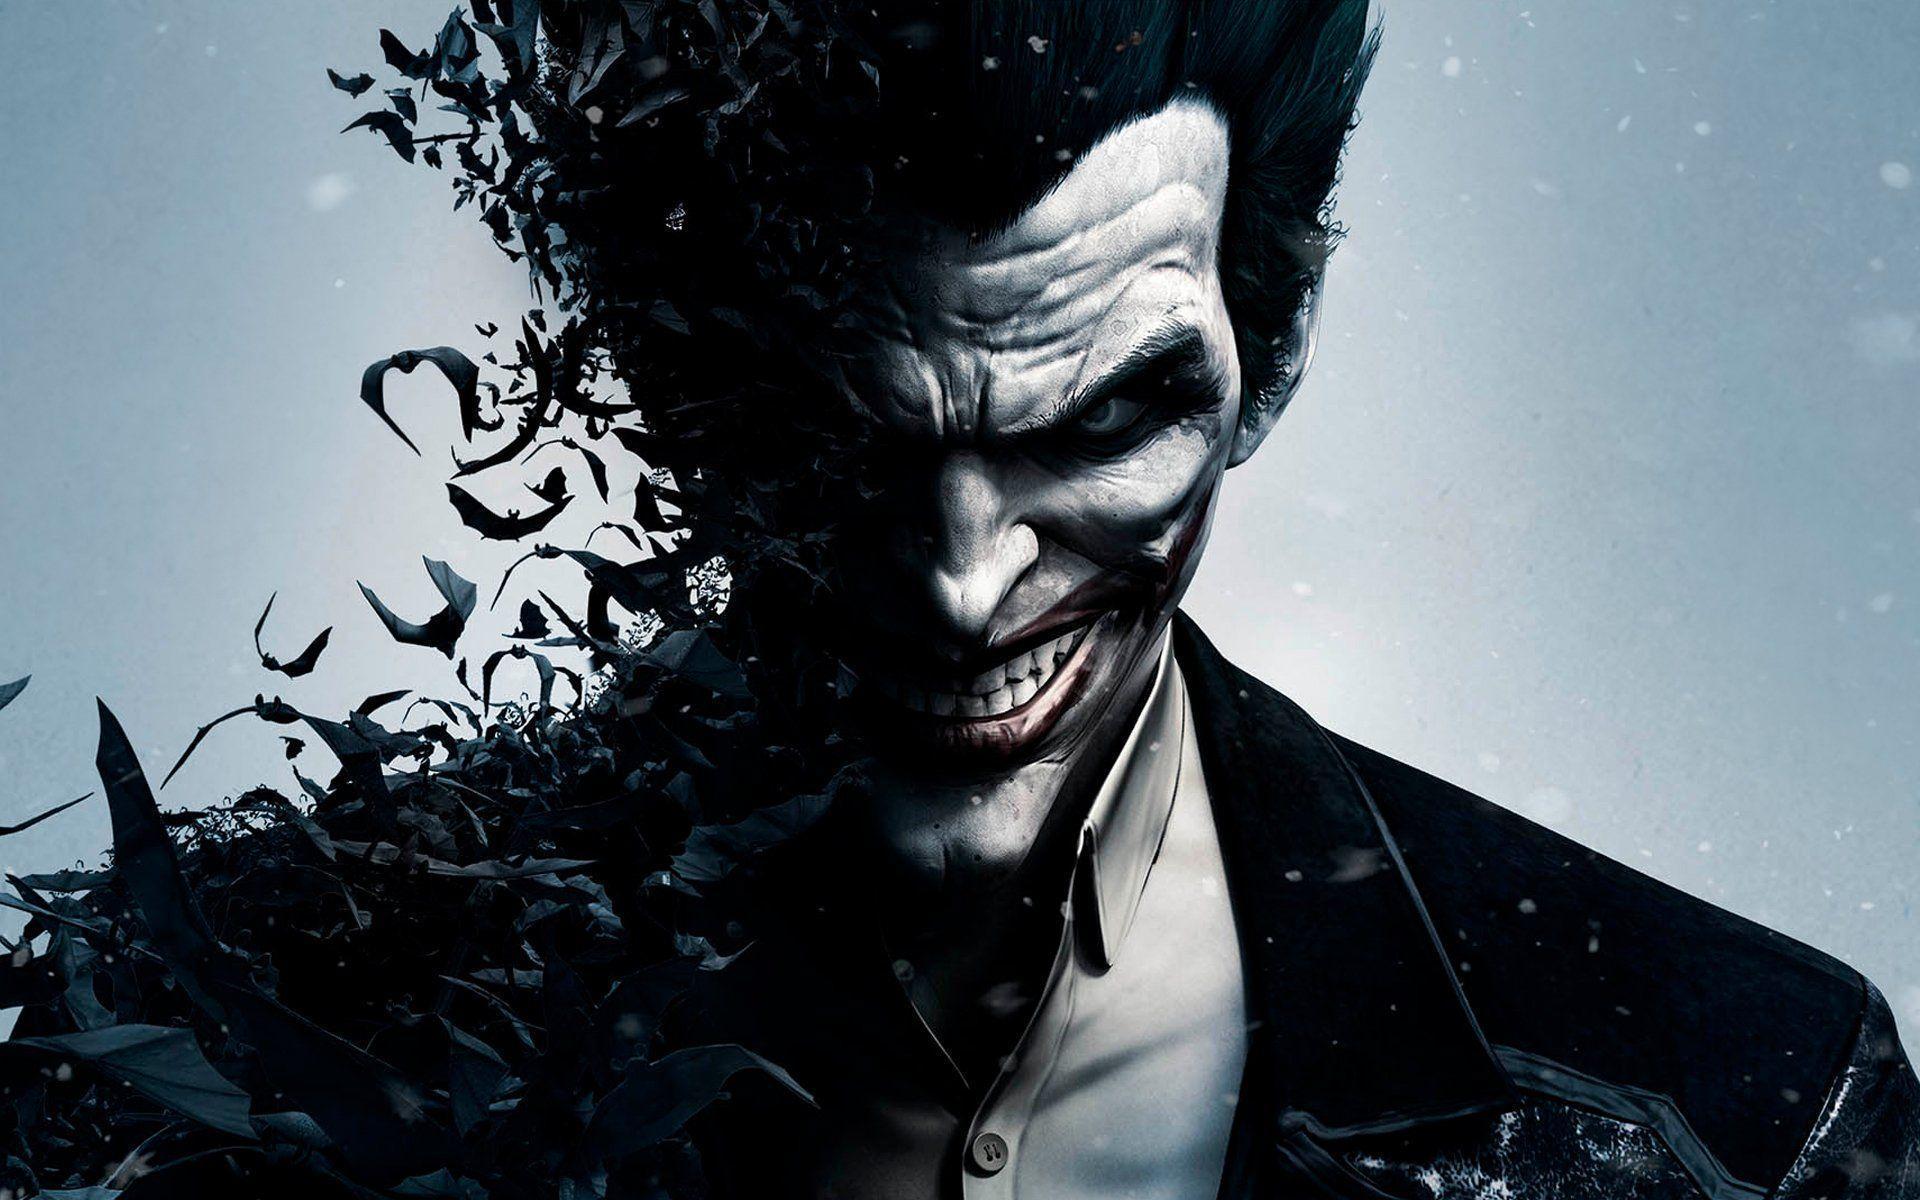 The Joker Hd Wallpapers Top Free The Joker Hd Backgrounds Wallpaperaccess